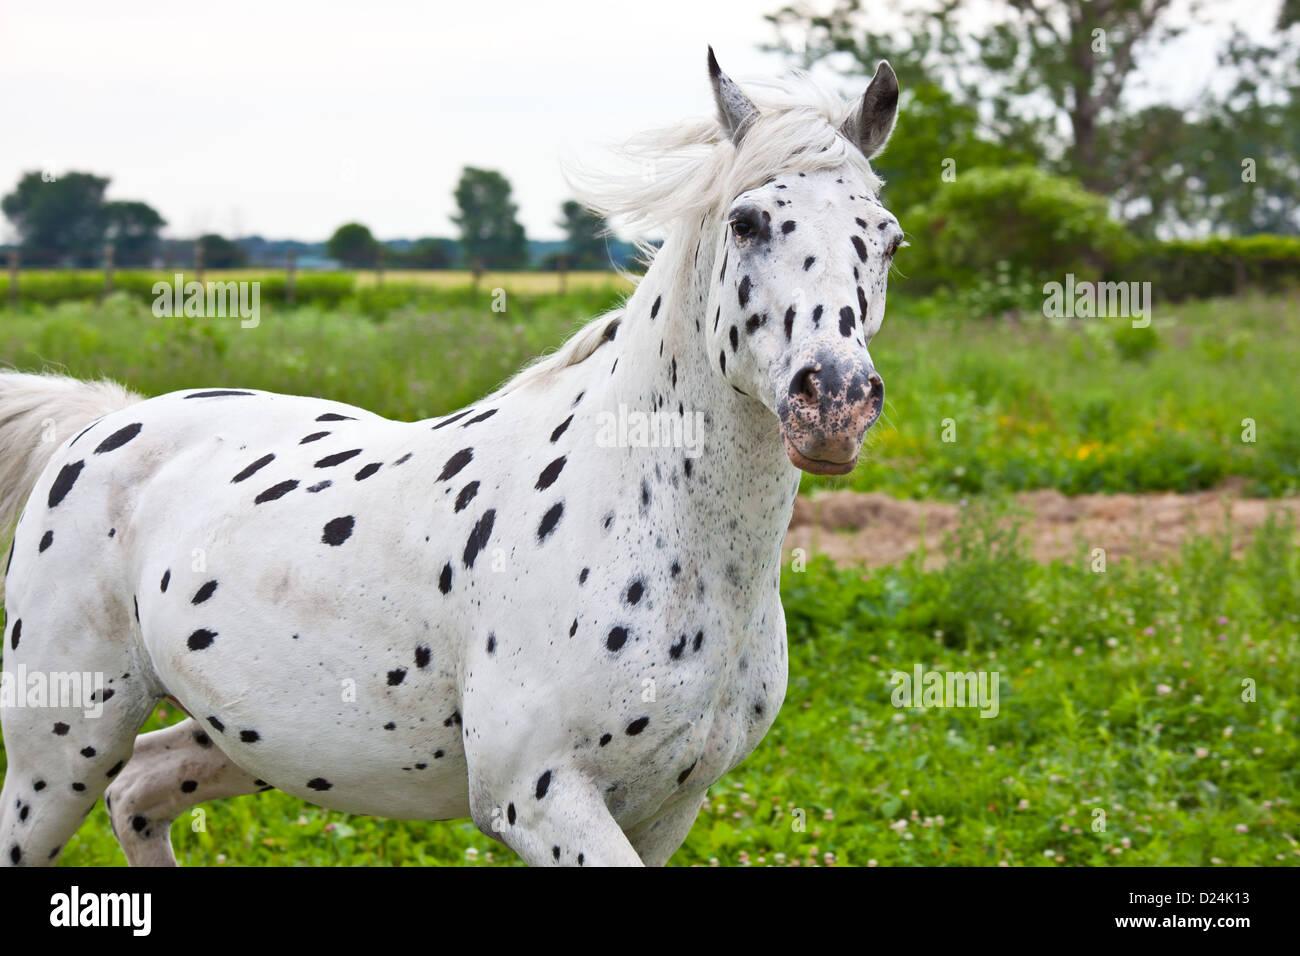 An appaloosa horse running in a green field Stock Photo